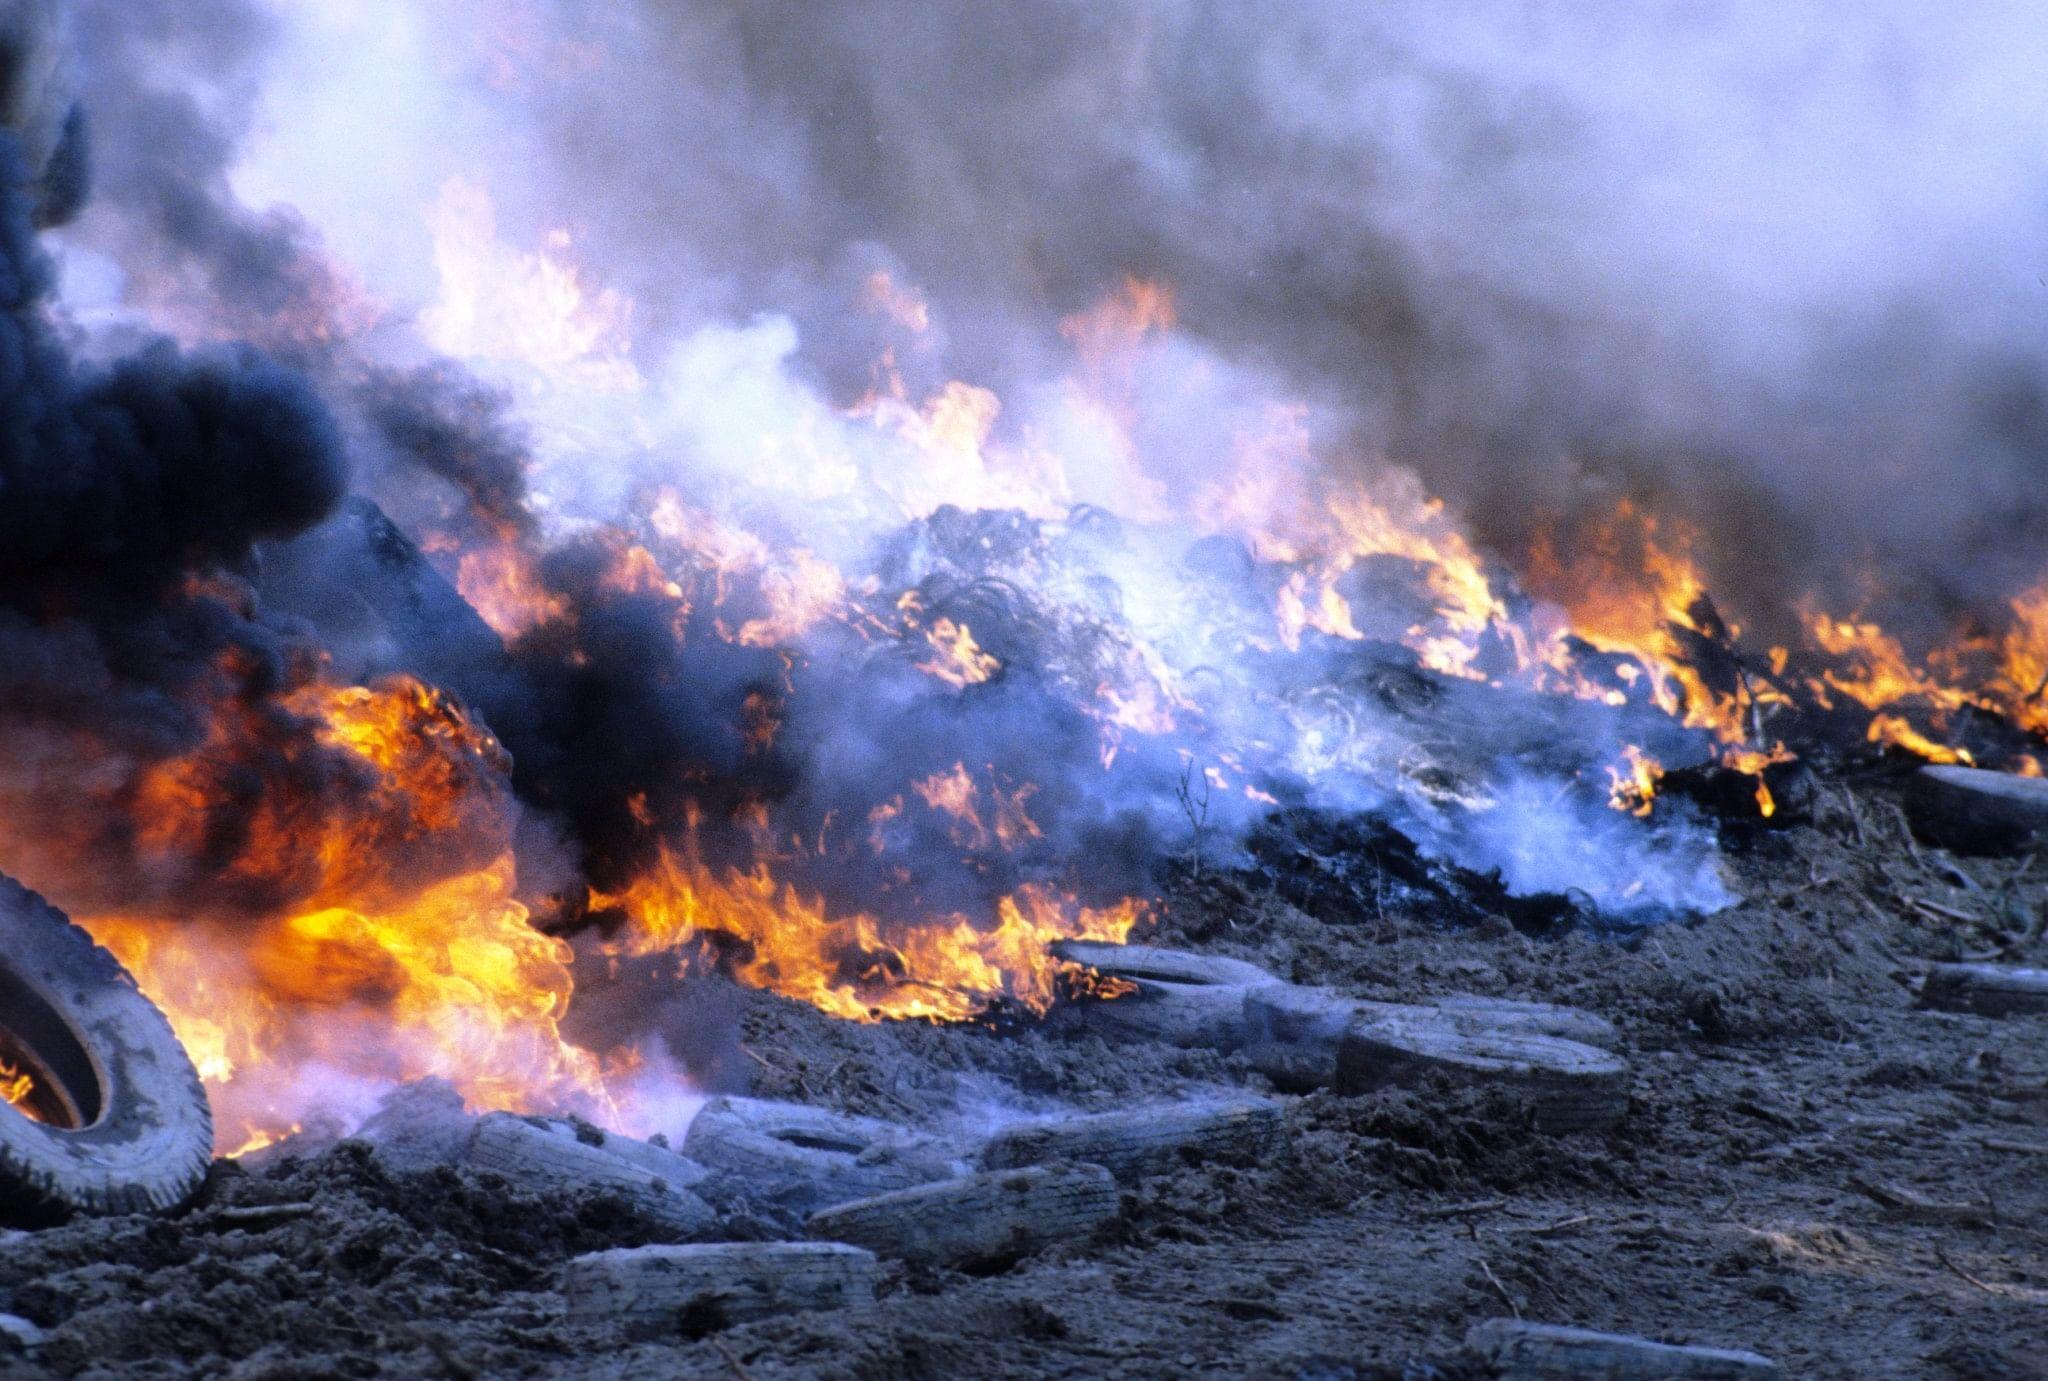 tyres burning